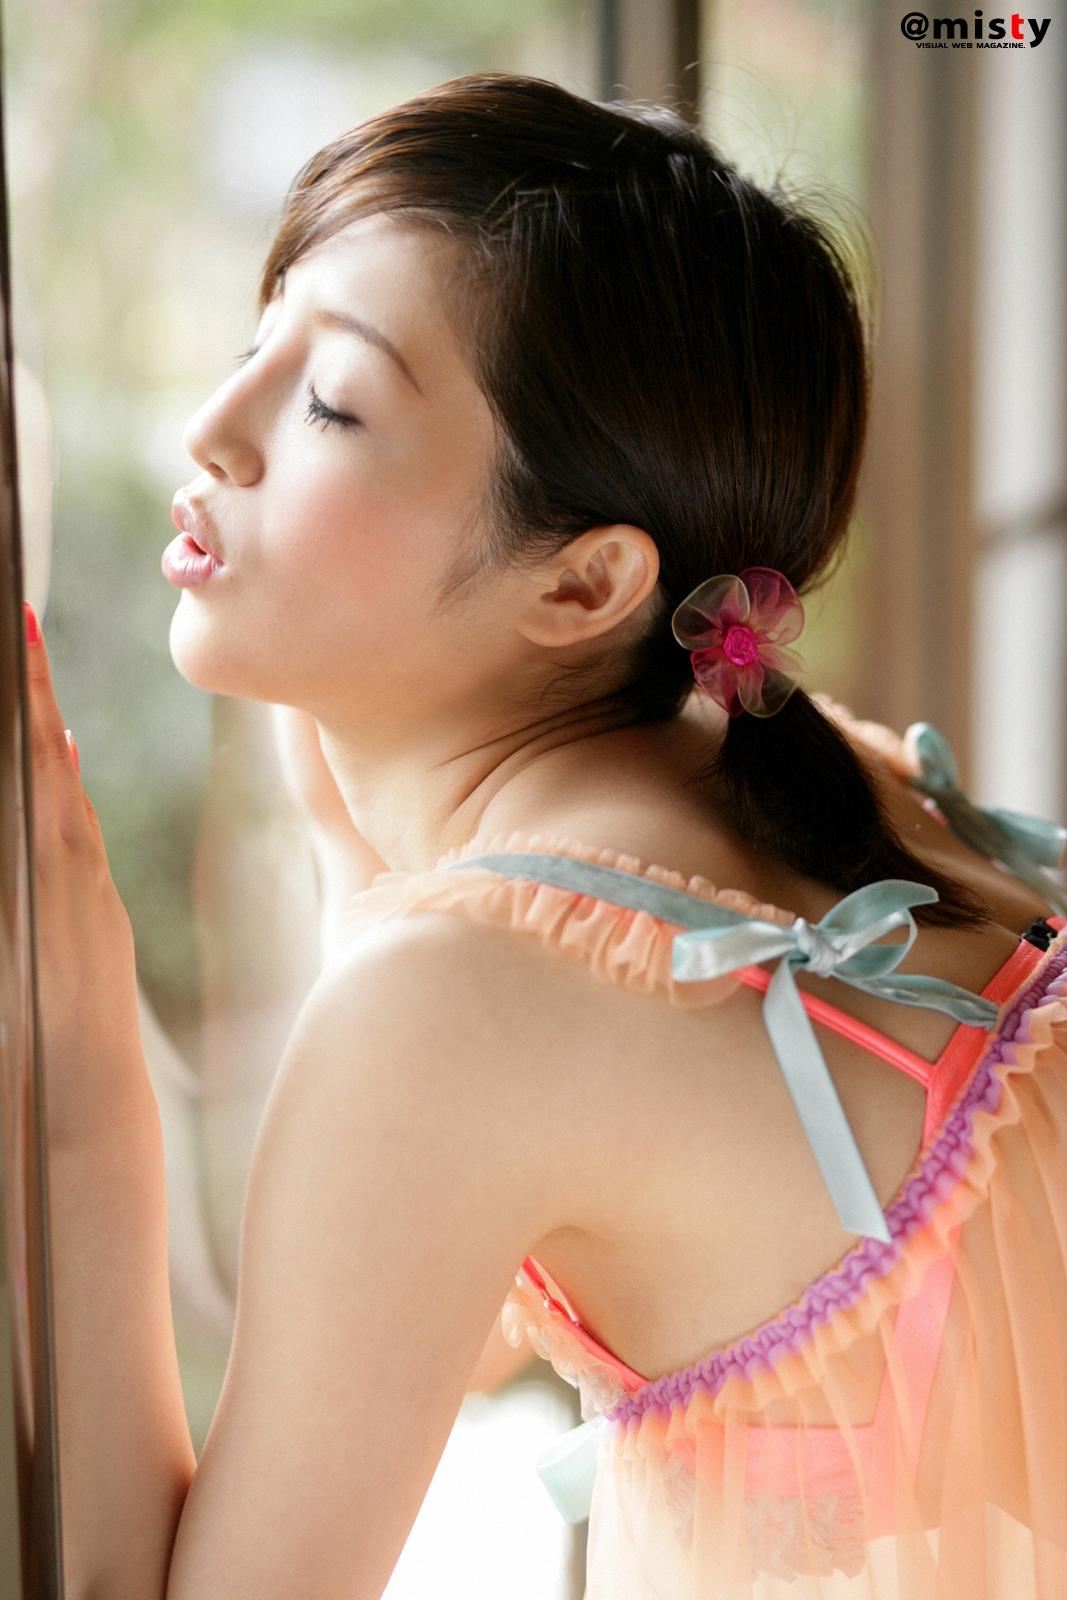 asian%252Bgirl r3 Gaelle Garcia Diaz Nude Pictures. 23 Jul 2010 at 18:32